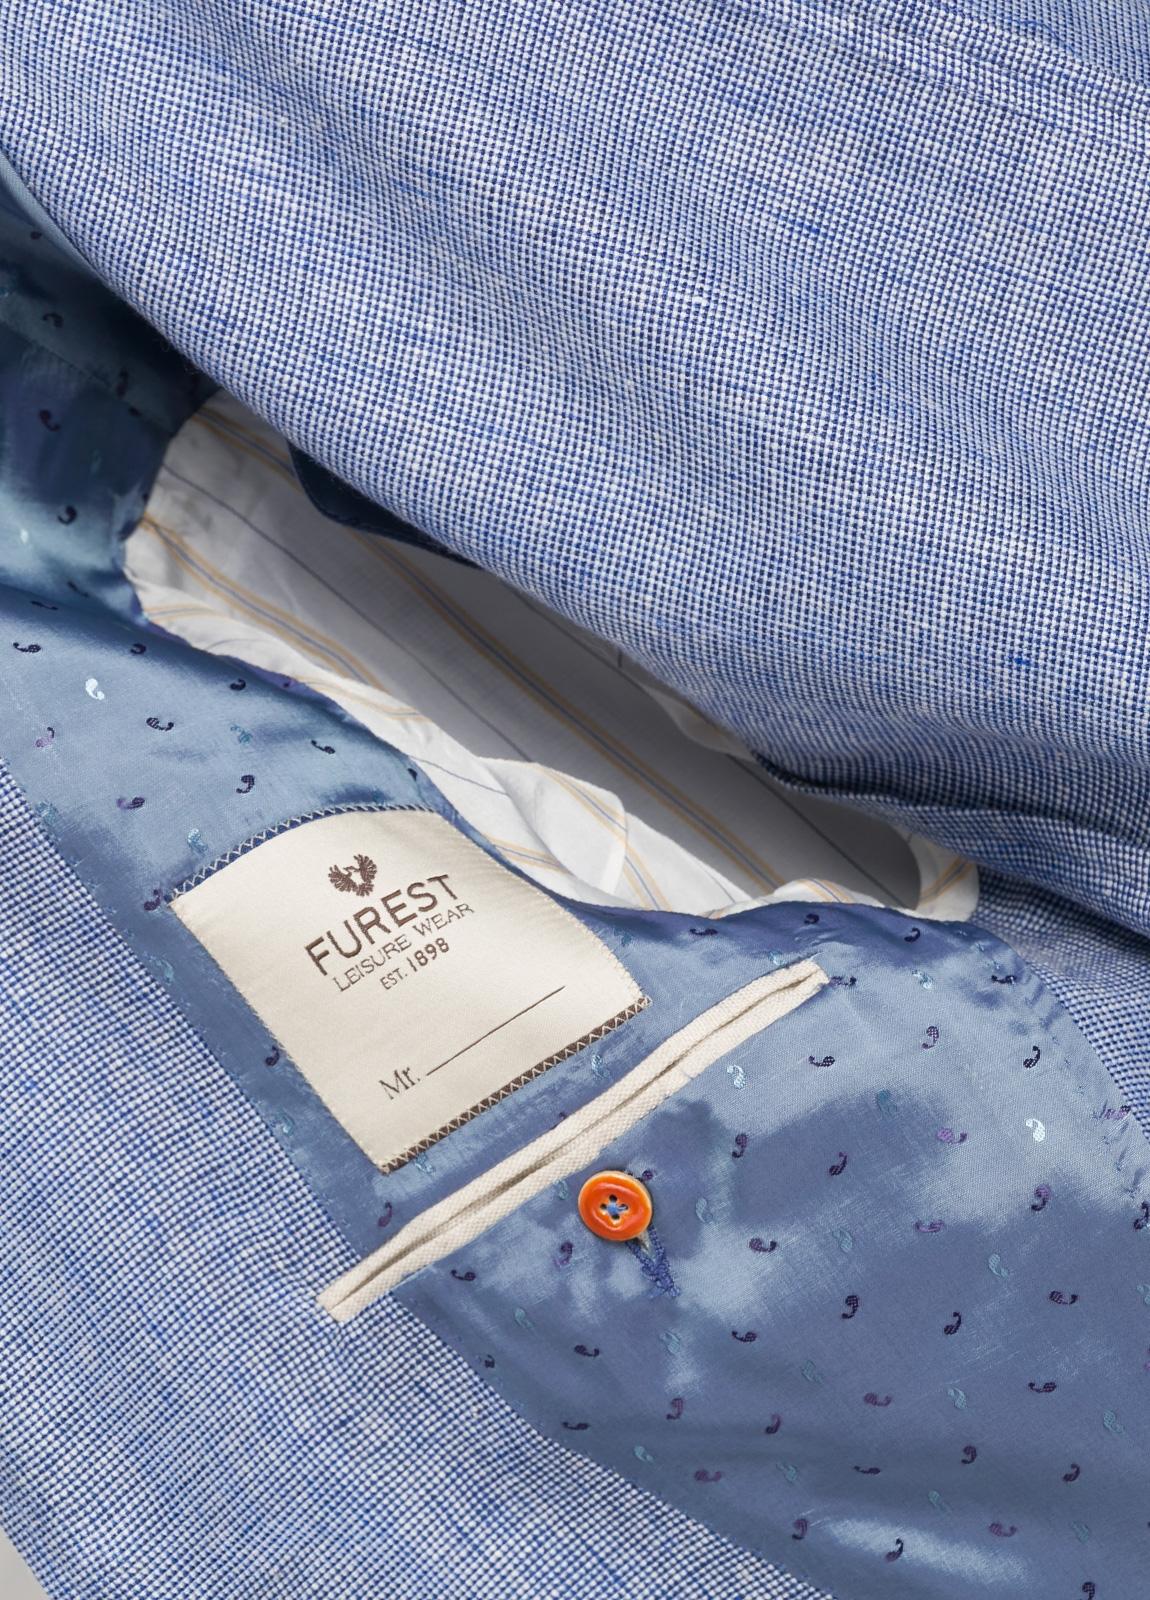 Americana SOFT JACKET Slim Fit diseño textura color azul. 60% Lino 18% Lana 12% Seda 10% Algodón. - Ítem3